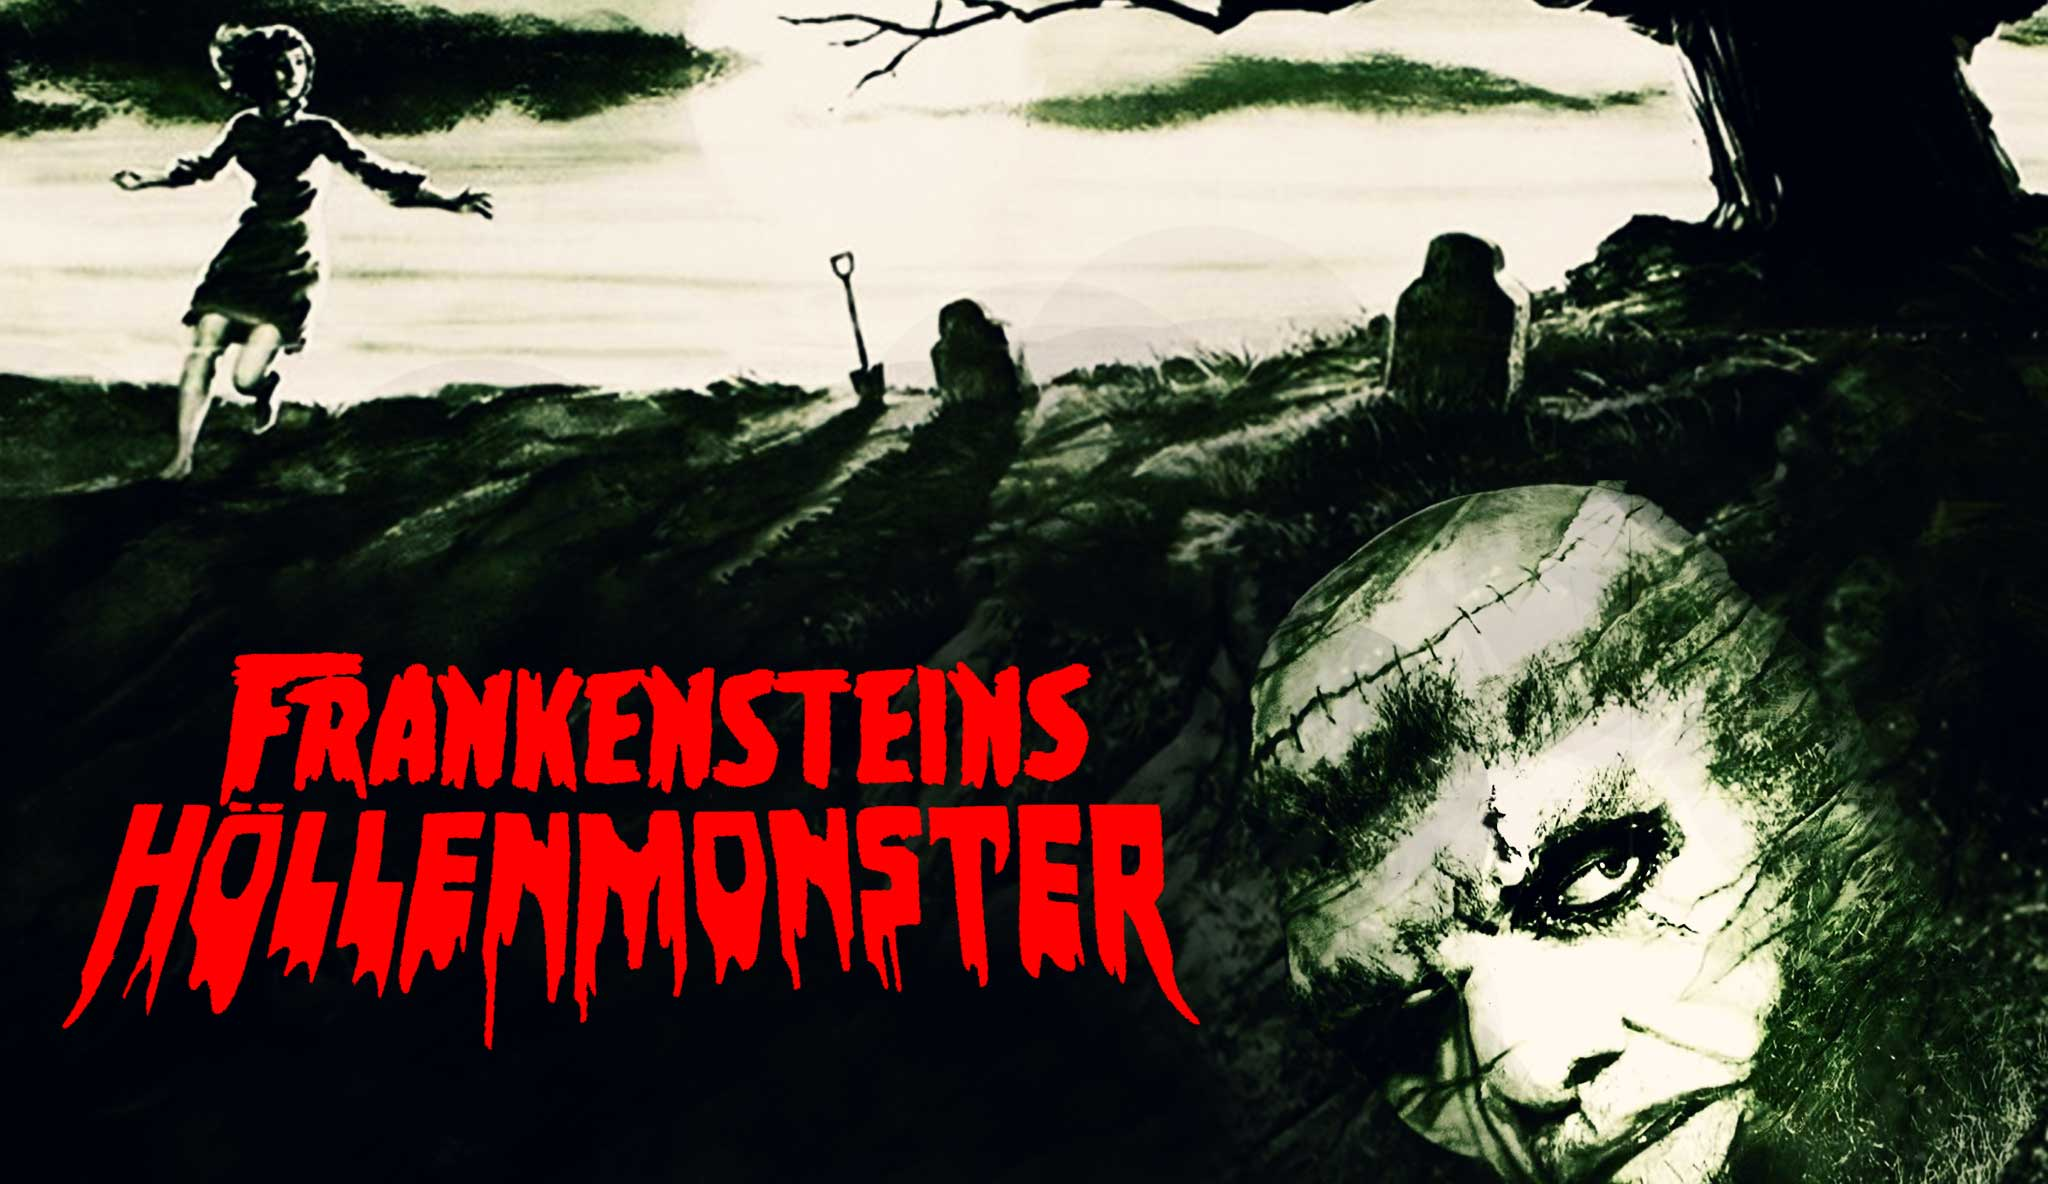 frankensteins-hollenmonster\header.jpg